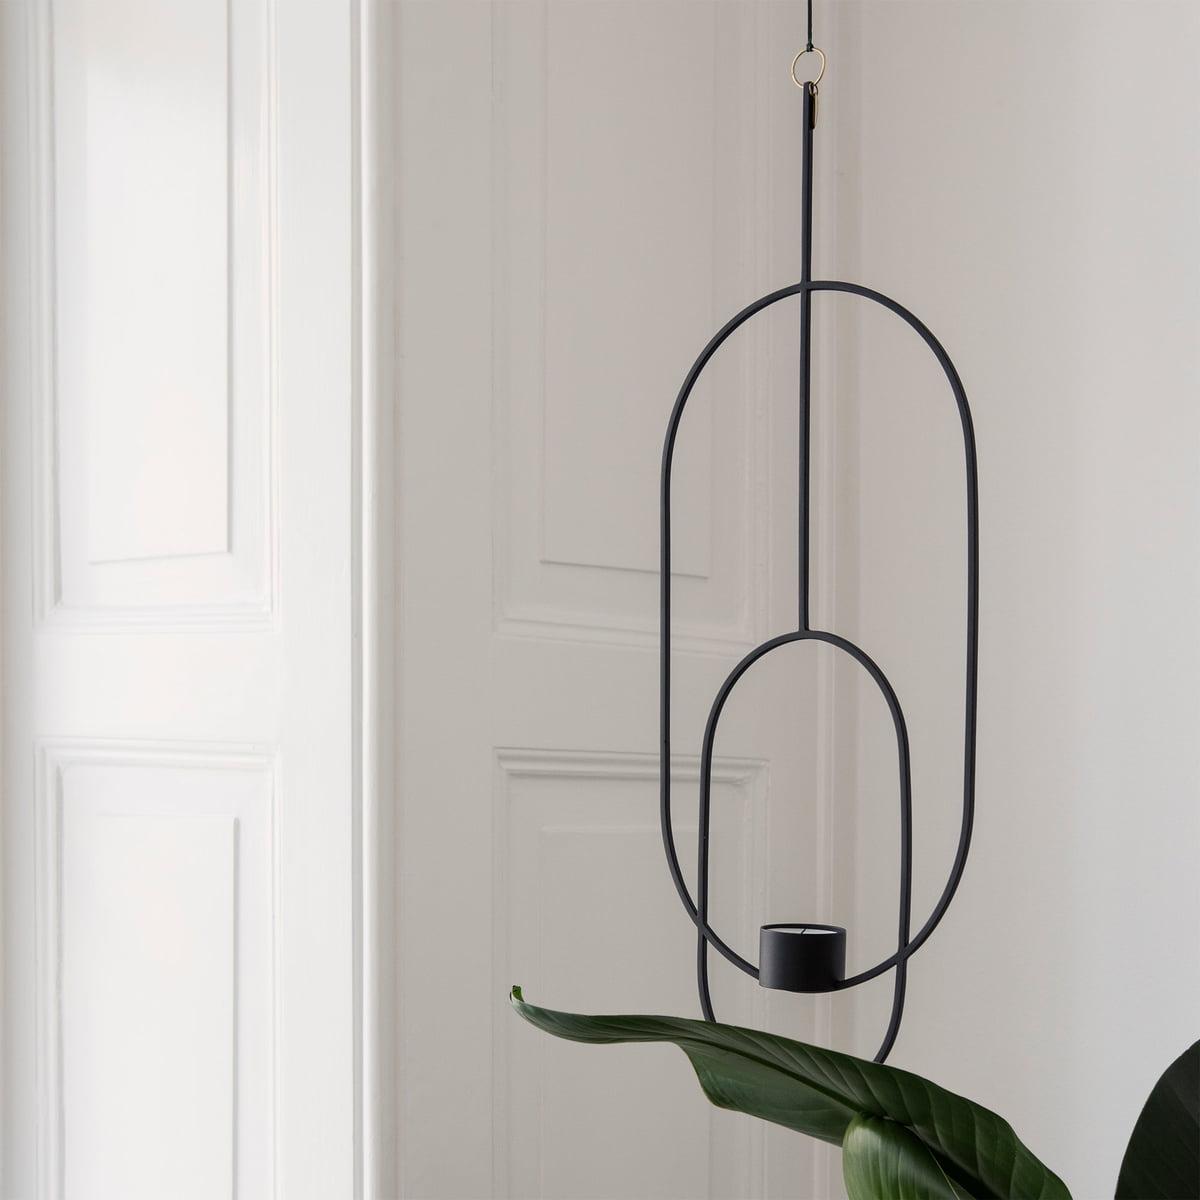 teelichthalter h ngend von ferm living. Black Bedroom Furniture Sets. Home Design Ideas